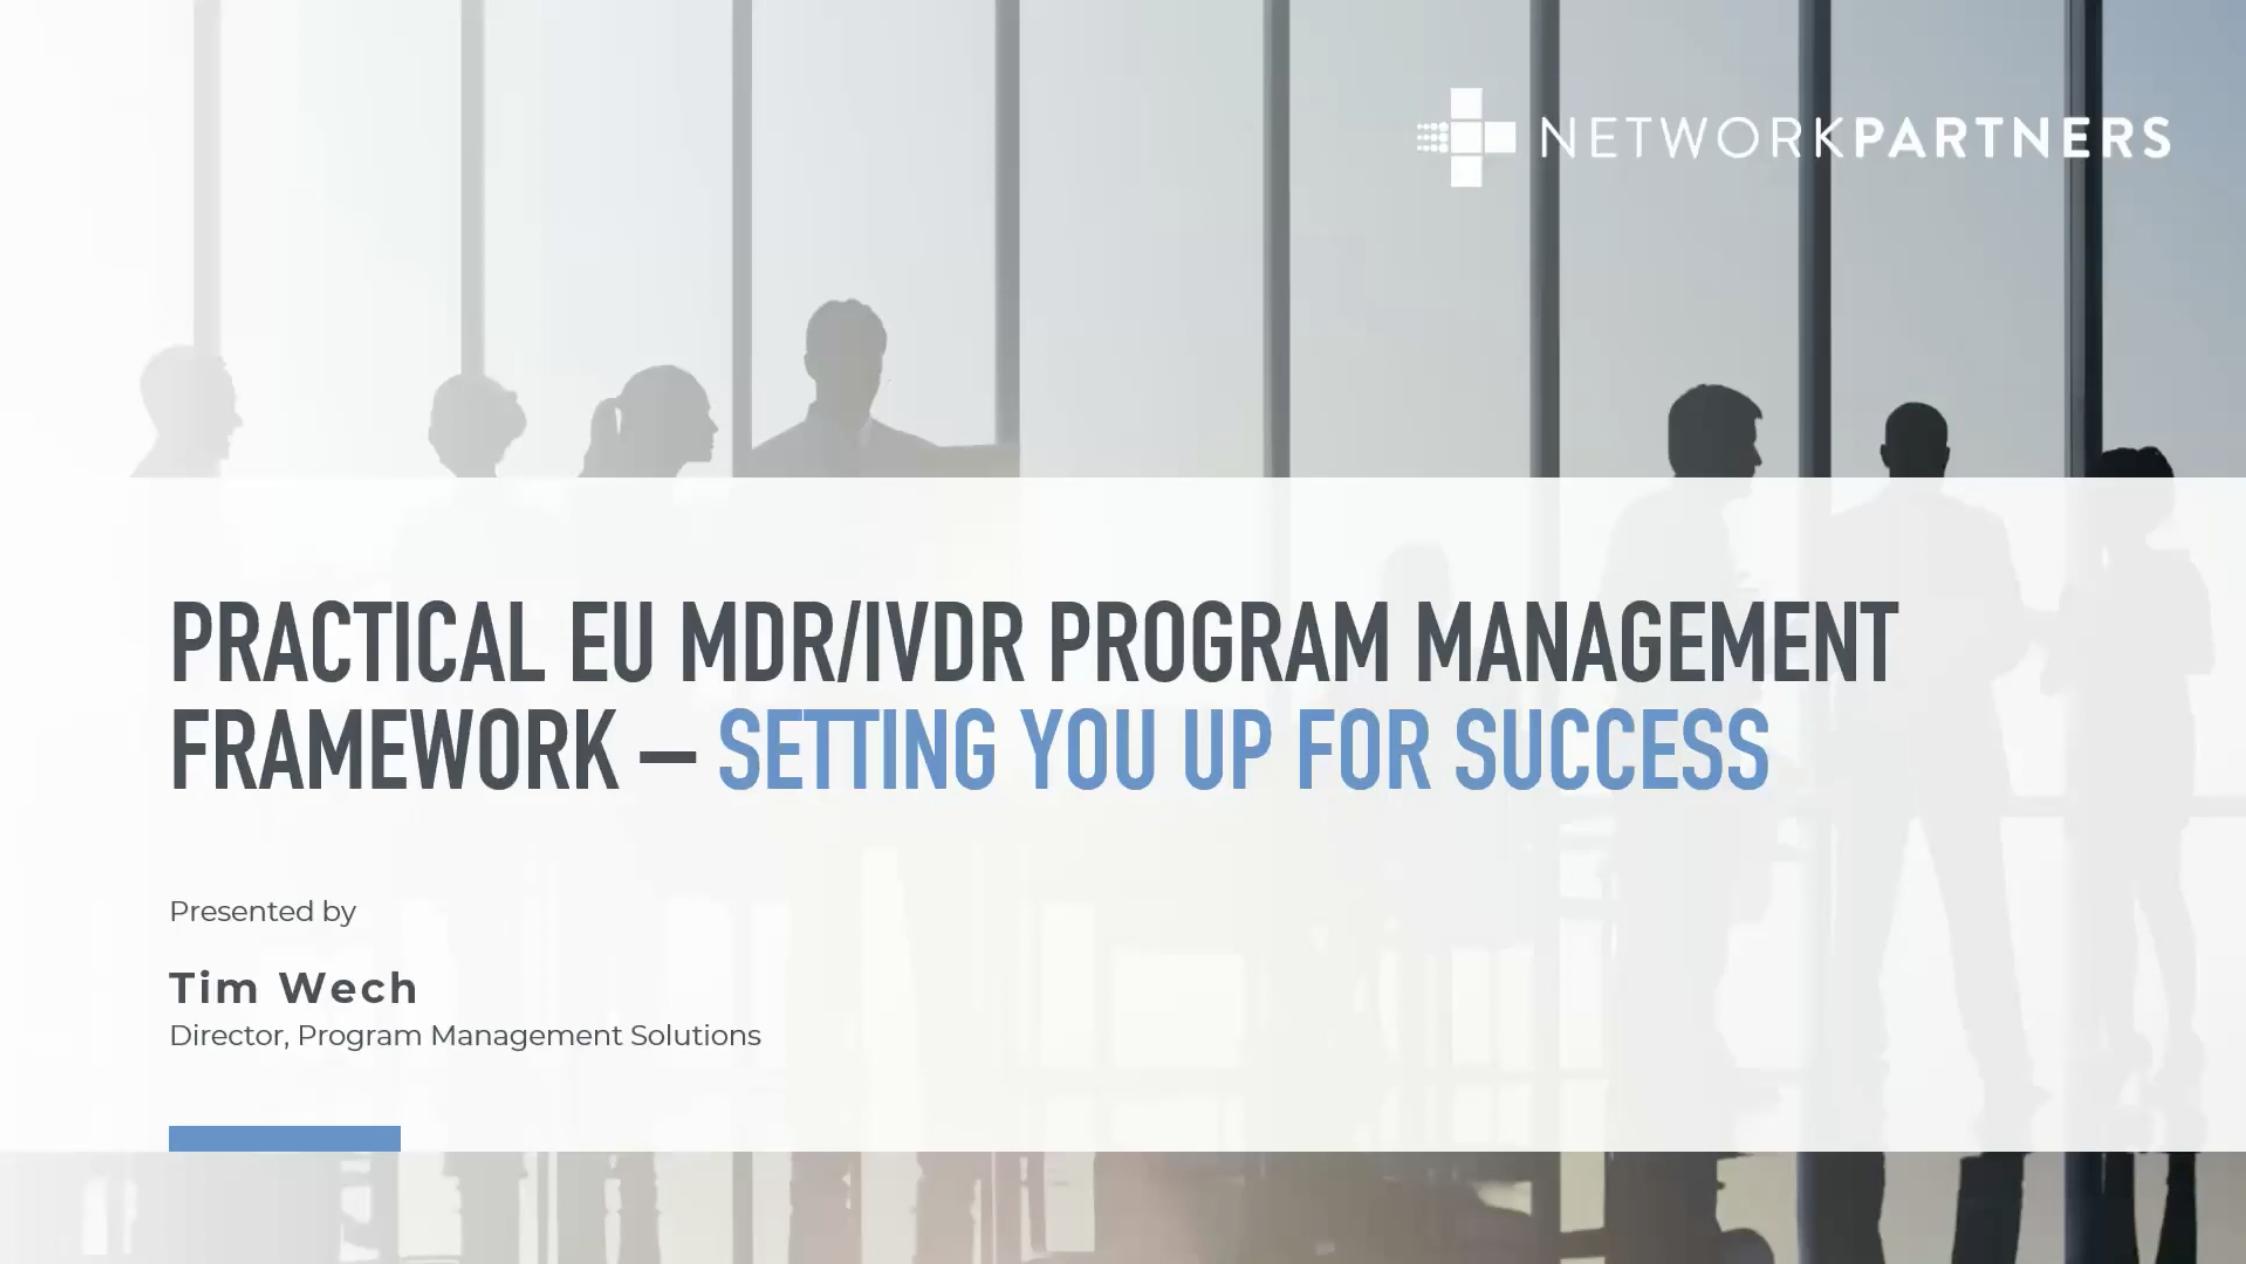 Practical EU MDRIVDR Program Management Framework - Setting You Up For Success Thumbnail